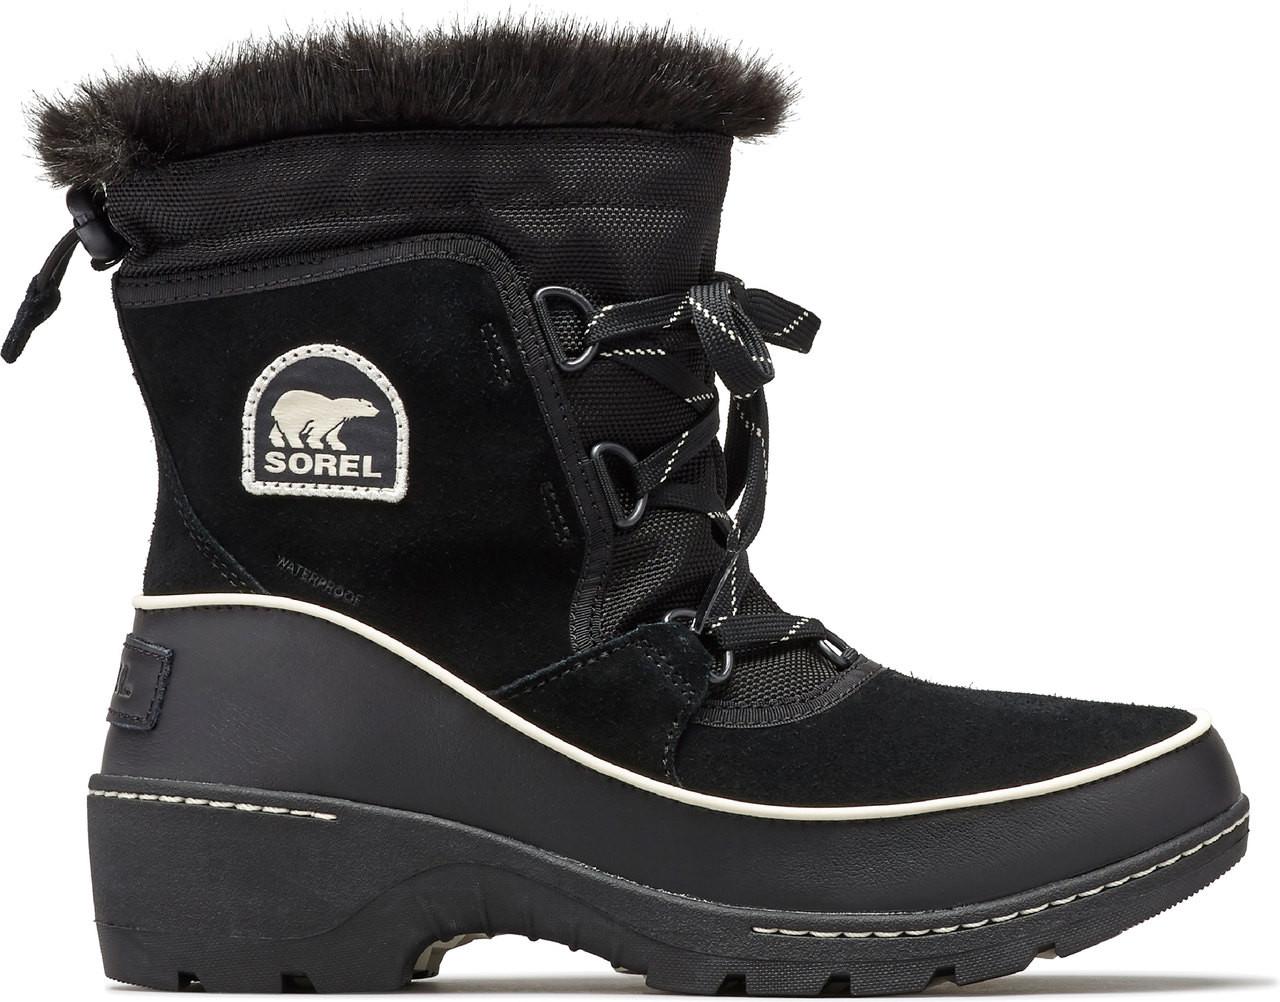 58412dd7396f Sorel Women s Tivoli III - FREE Shipping   FREE Returns - Women s Boots